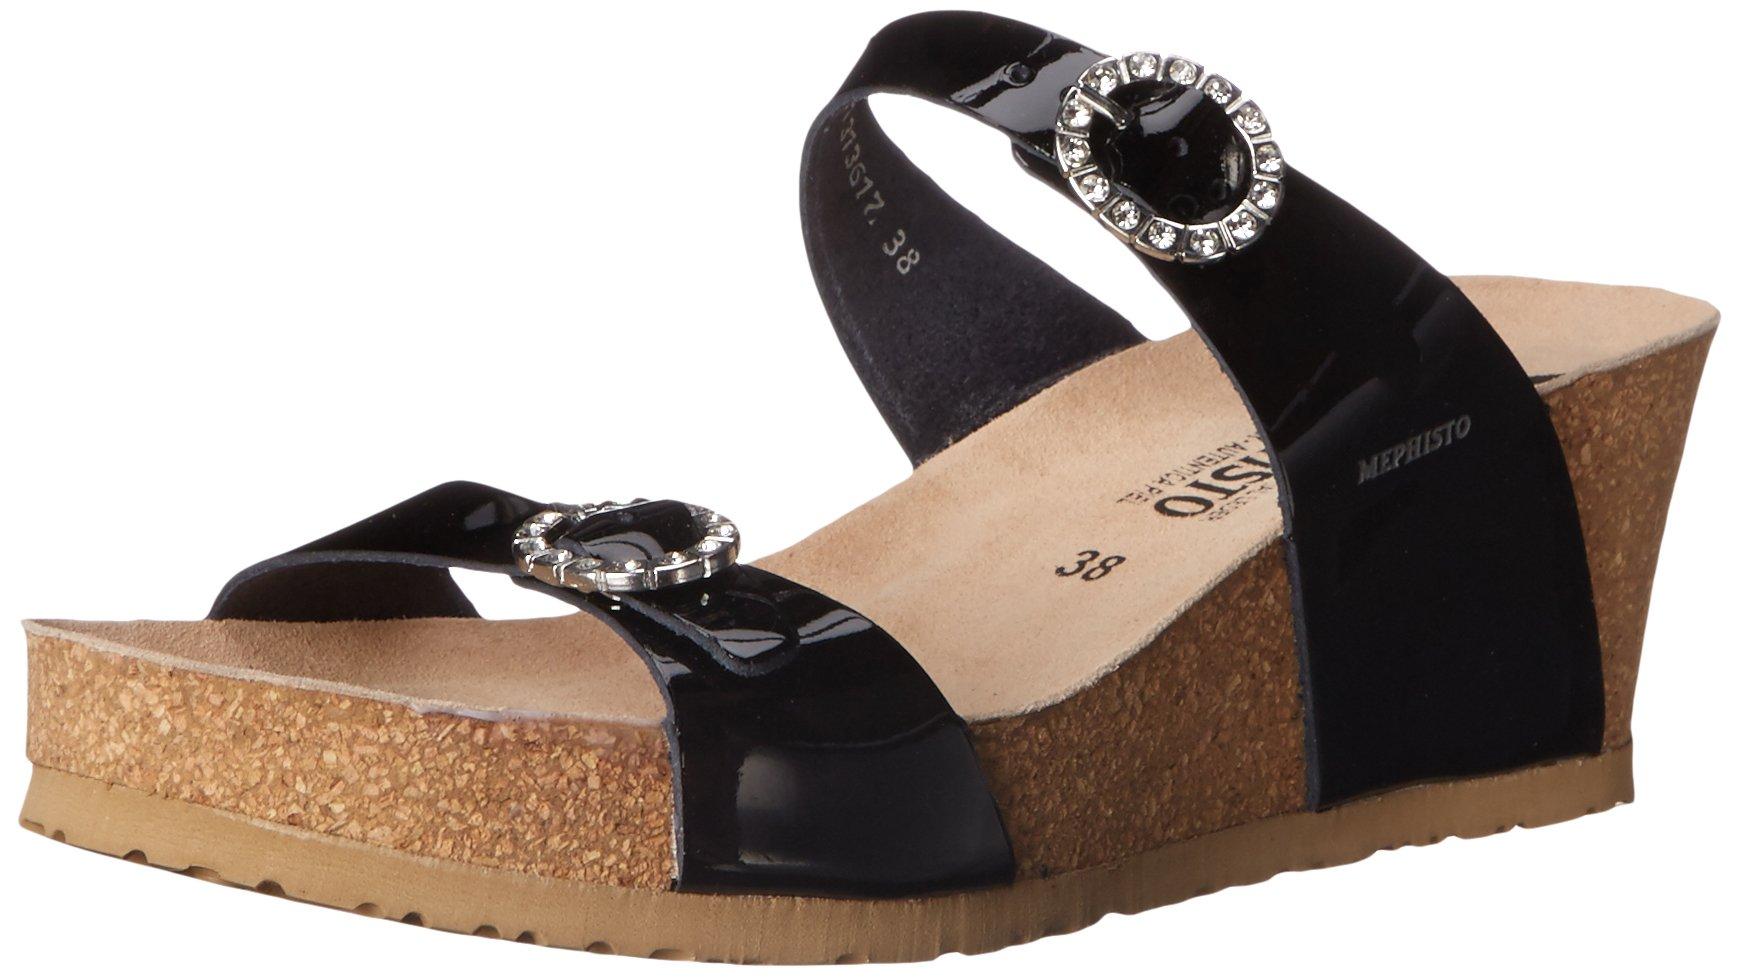 Mephisto Women's Lidia Platform Dress Sandal, Black Patent, 7 M US